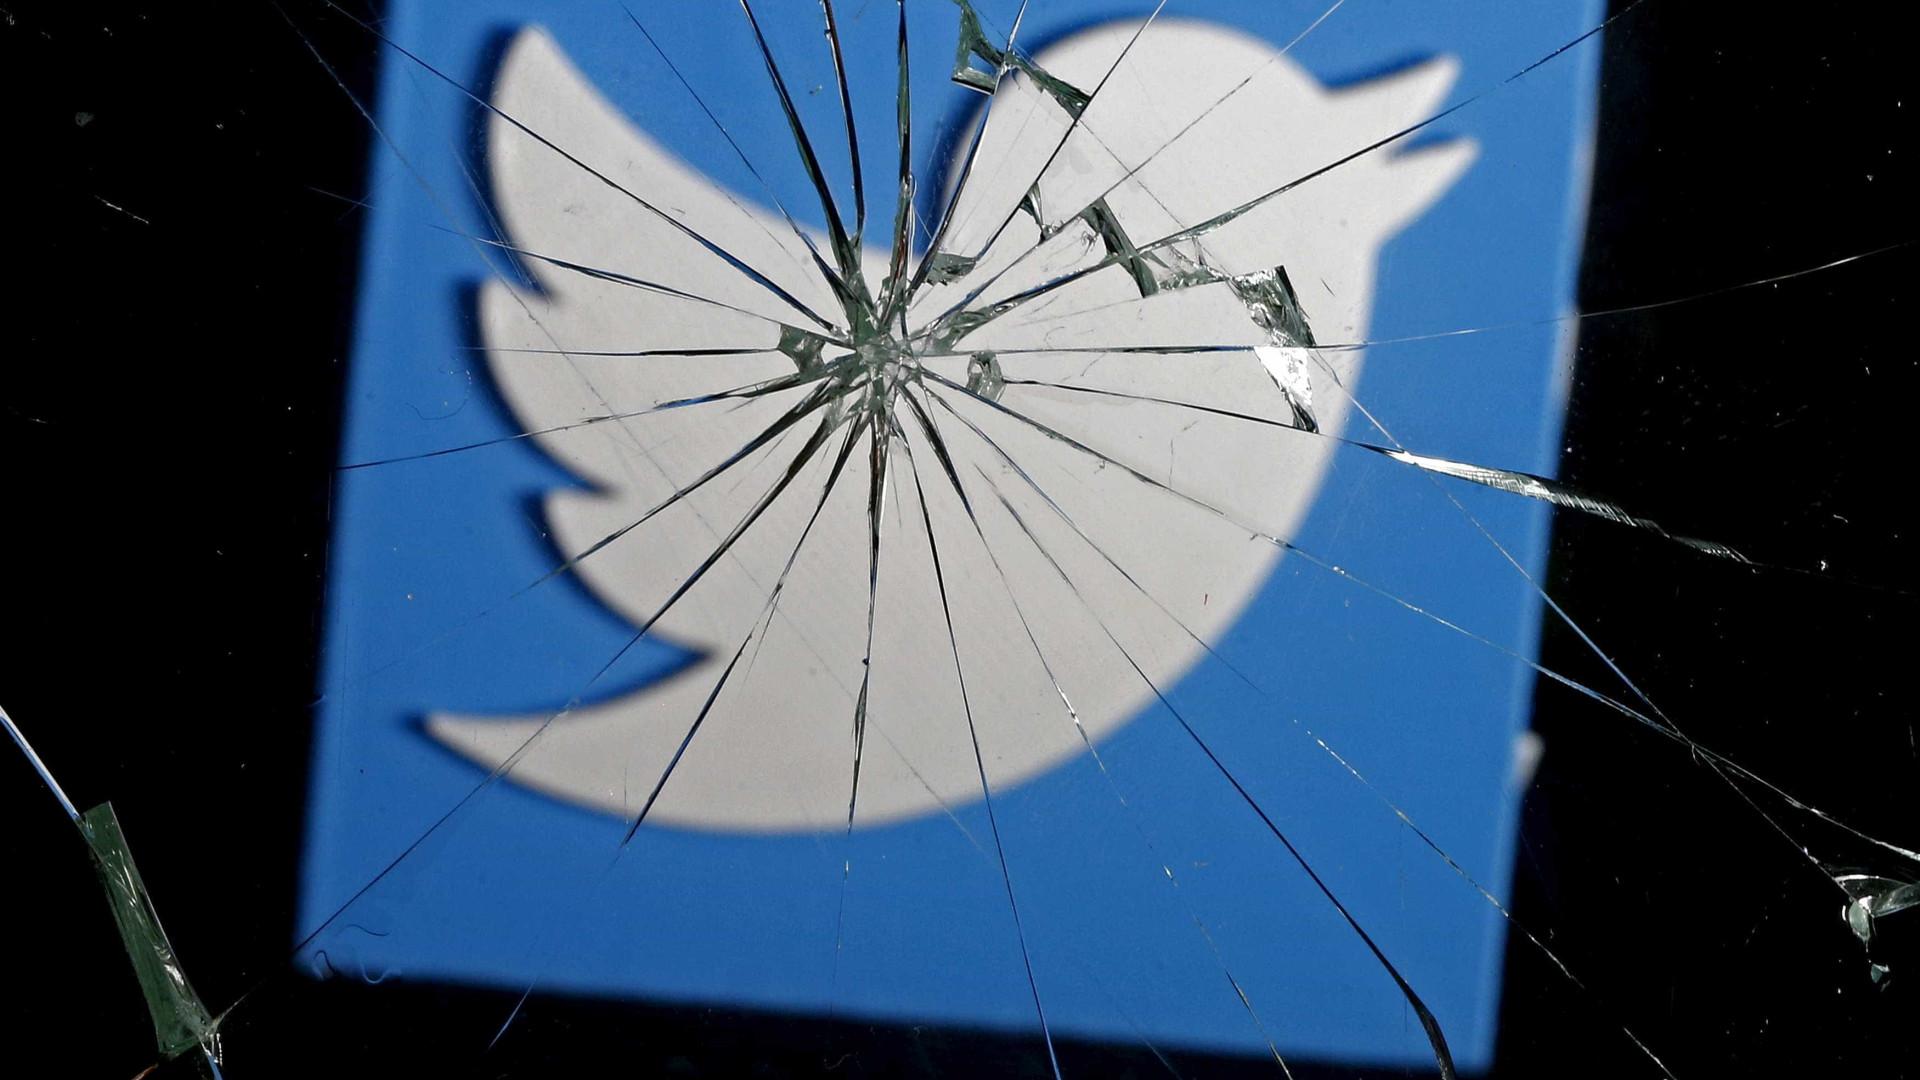 Twitter caiu? Serviço passa por instabilidade nesta sexta